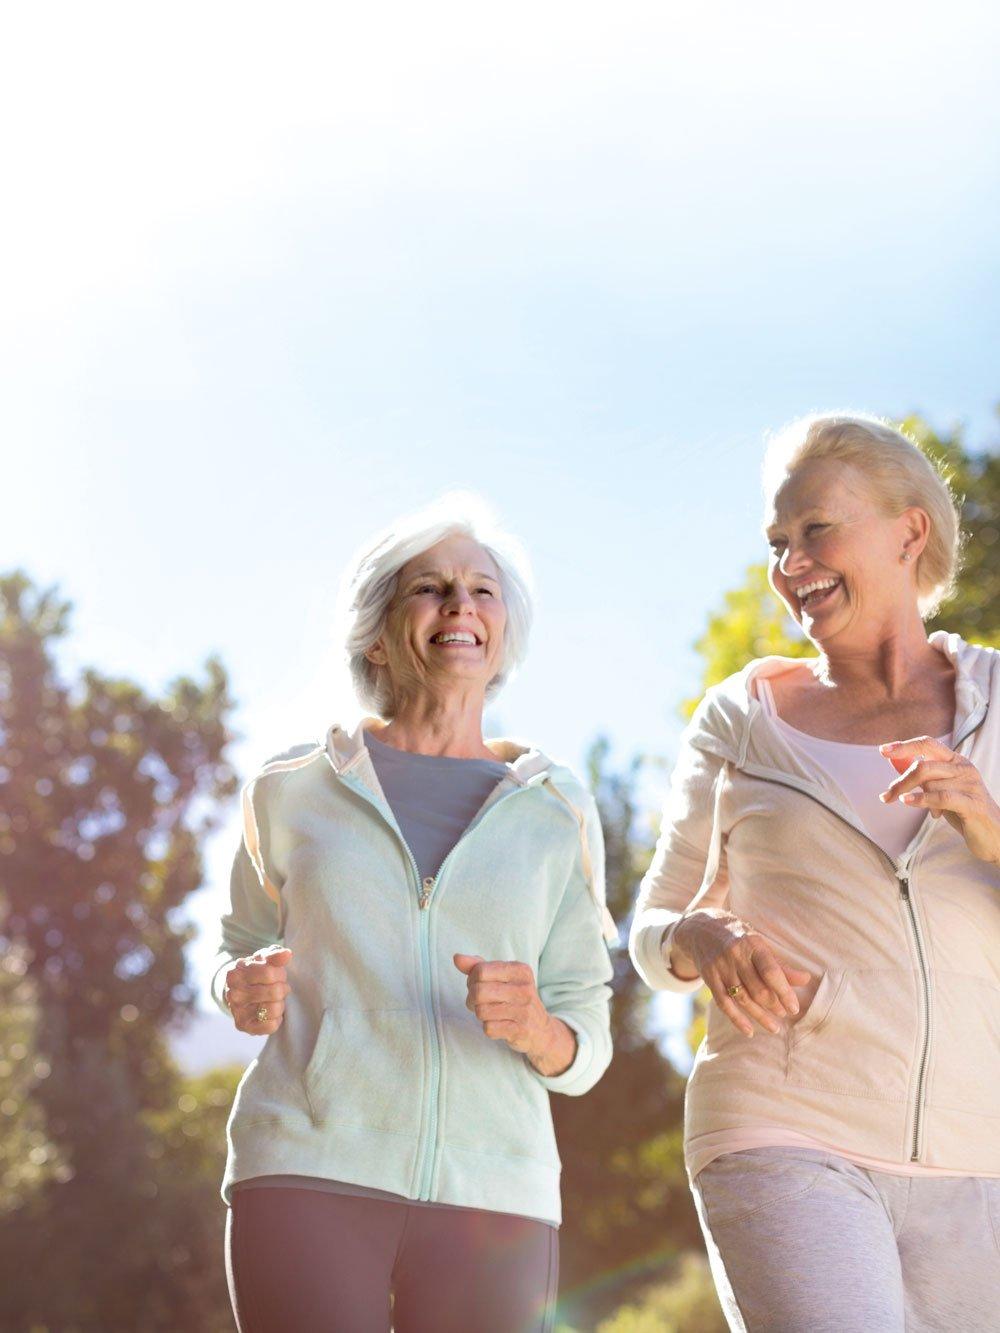 Two senior women running together outside, smiling, sun shining at Strathalan Macleod